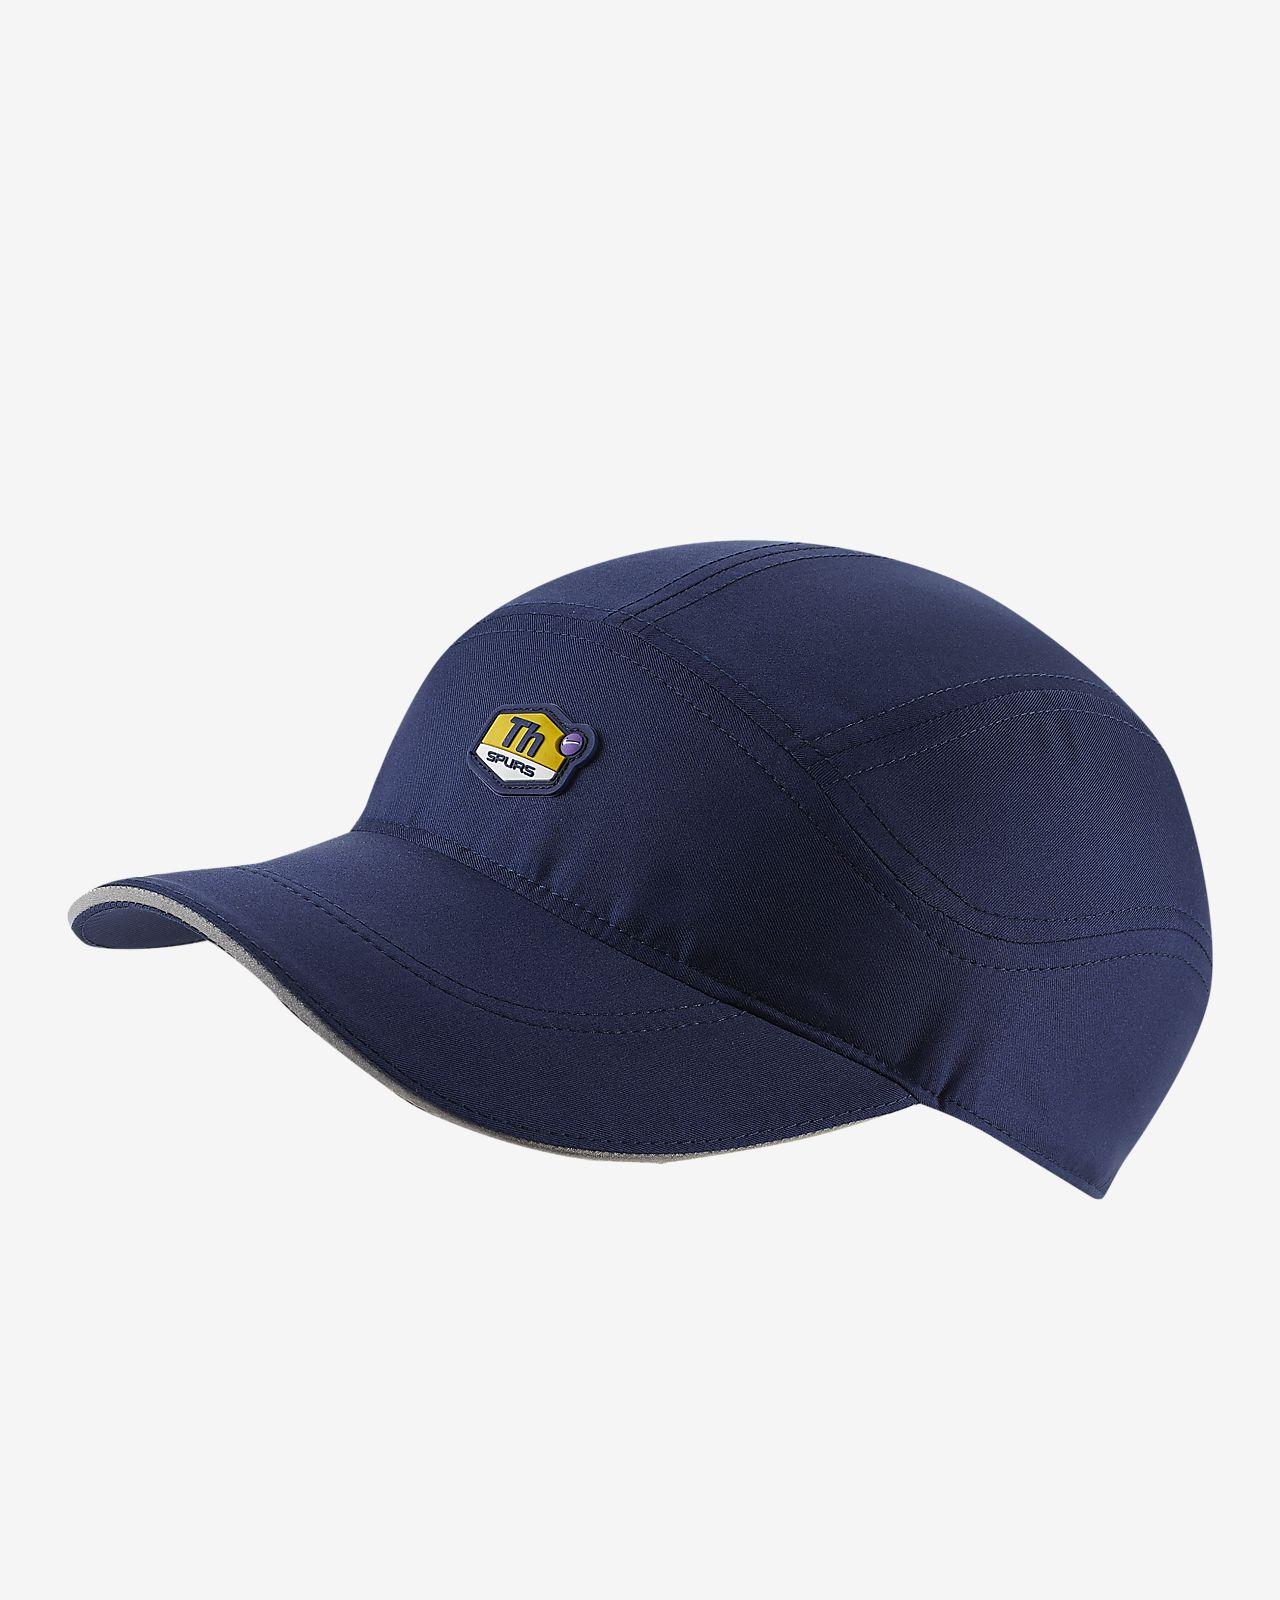 Tottenham Hotspur Tailwind Hat